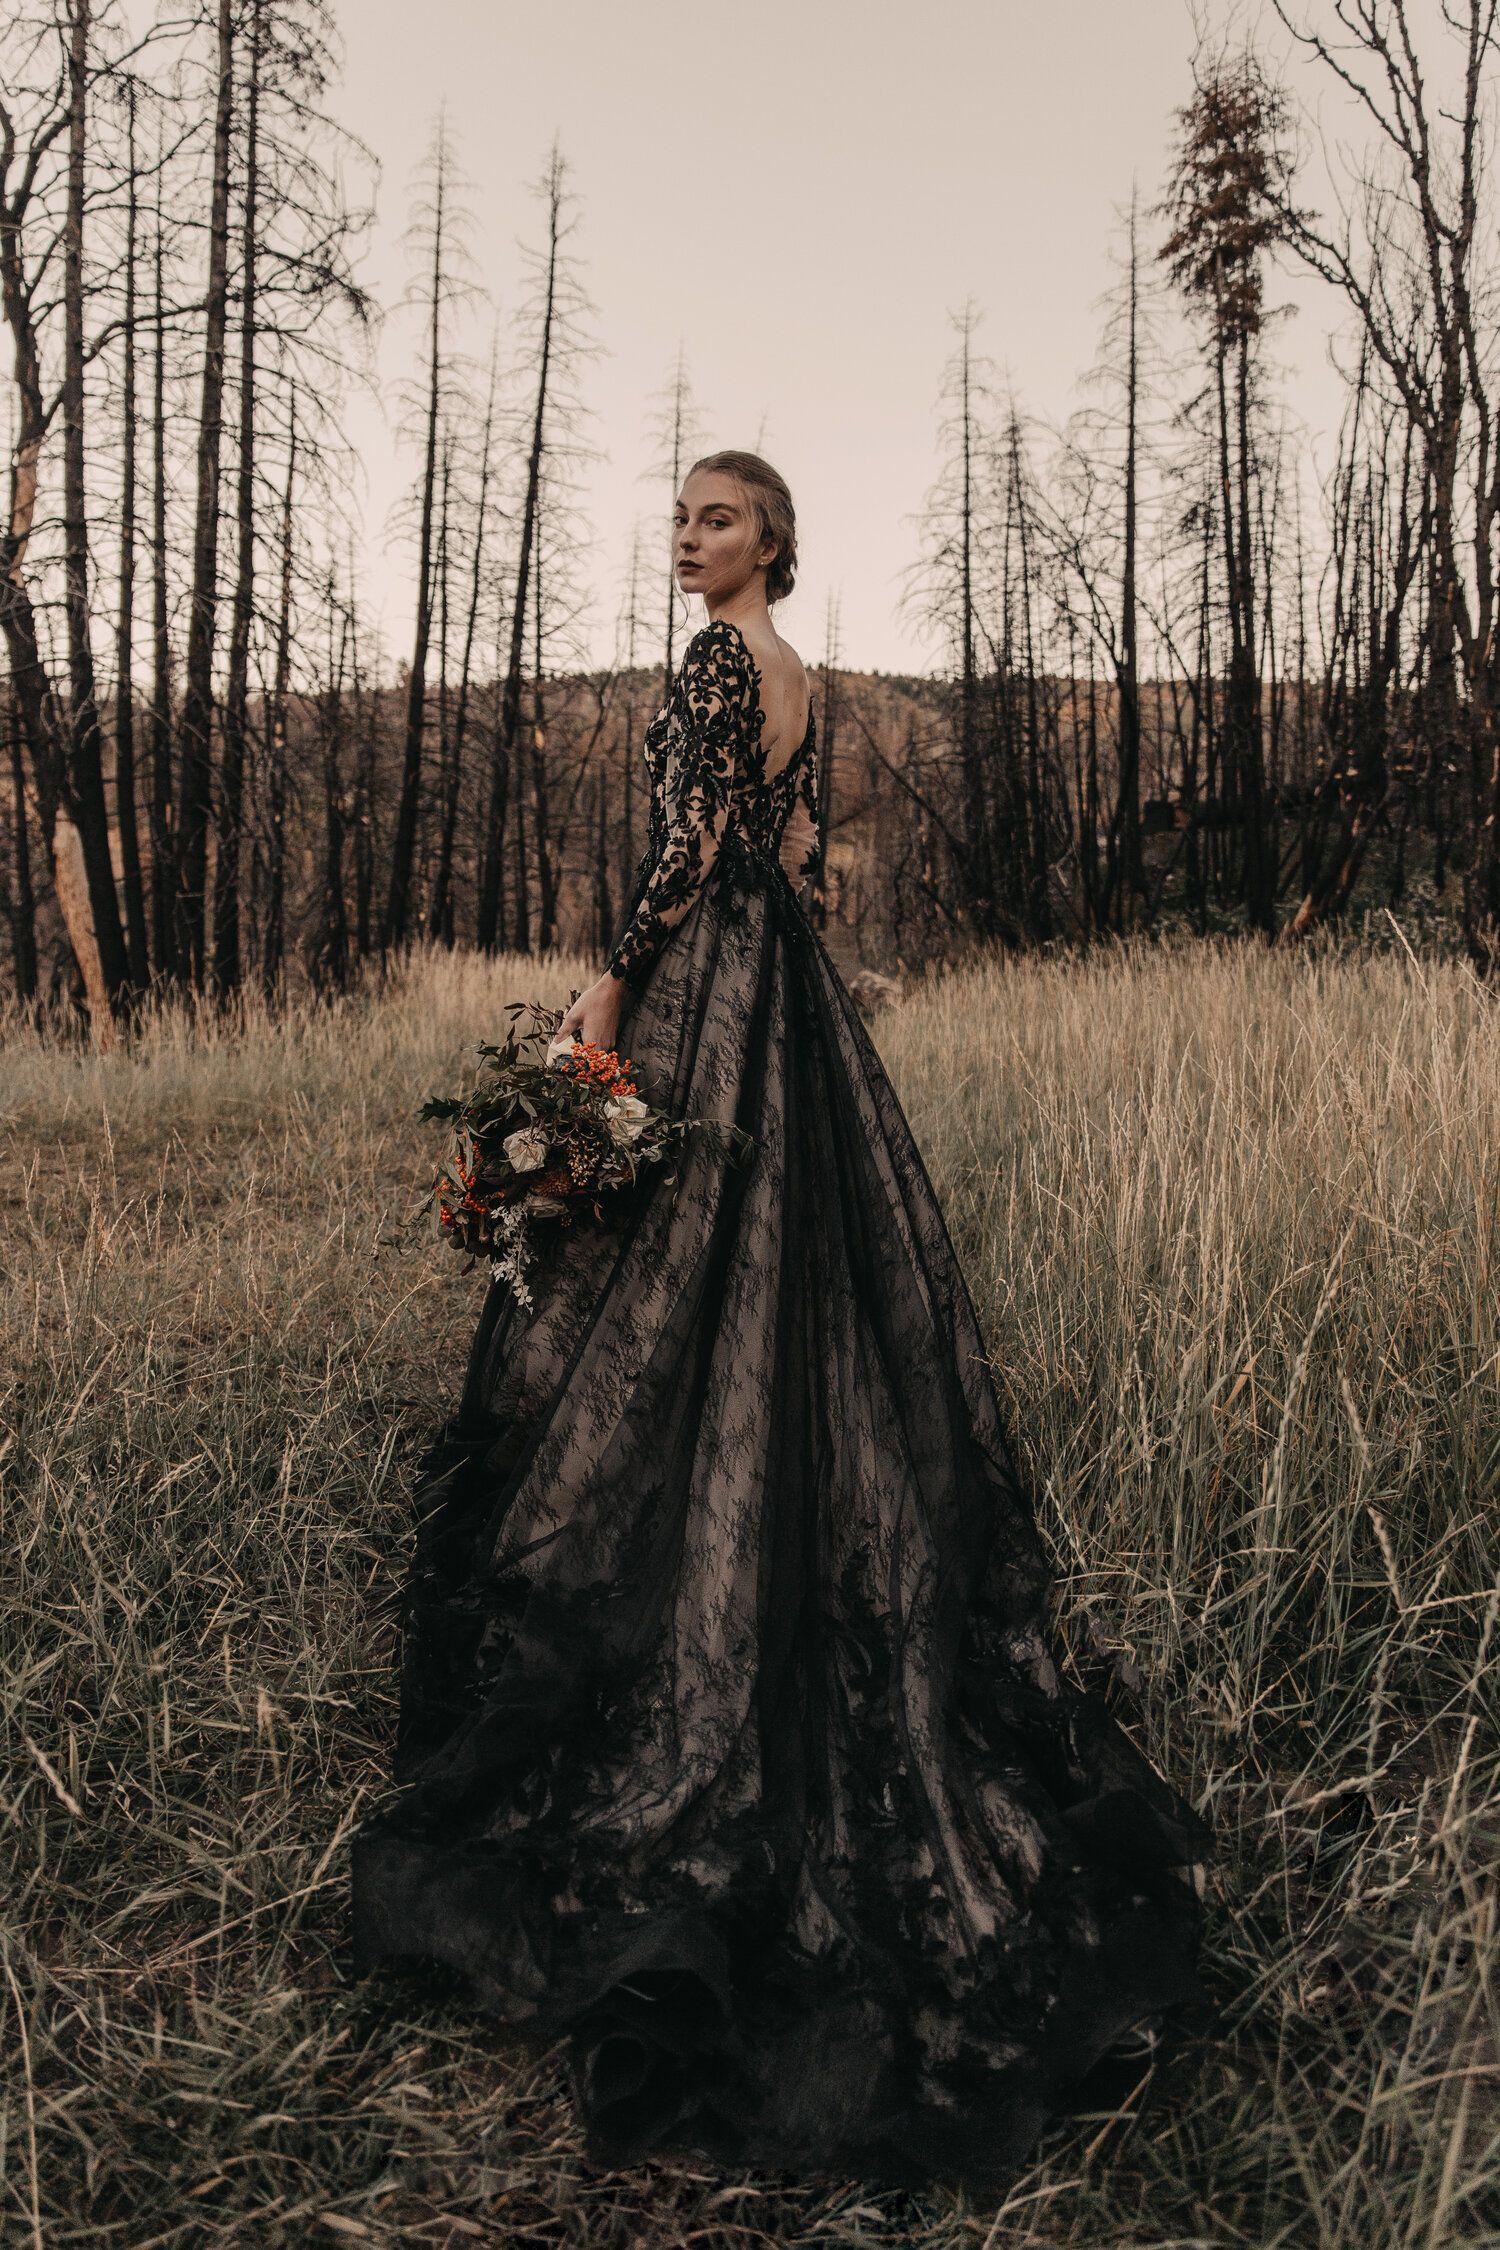 Autumn Bridal Editorial Parting Birds Natalie Michelle Photo Co Gothic Wedding Dress Black Wedding Dresses Wedding Dress Guide [ 2250 x 1500 Pixel ]